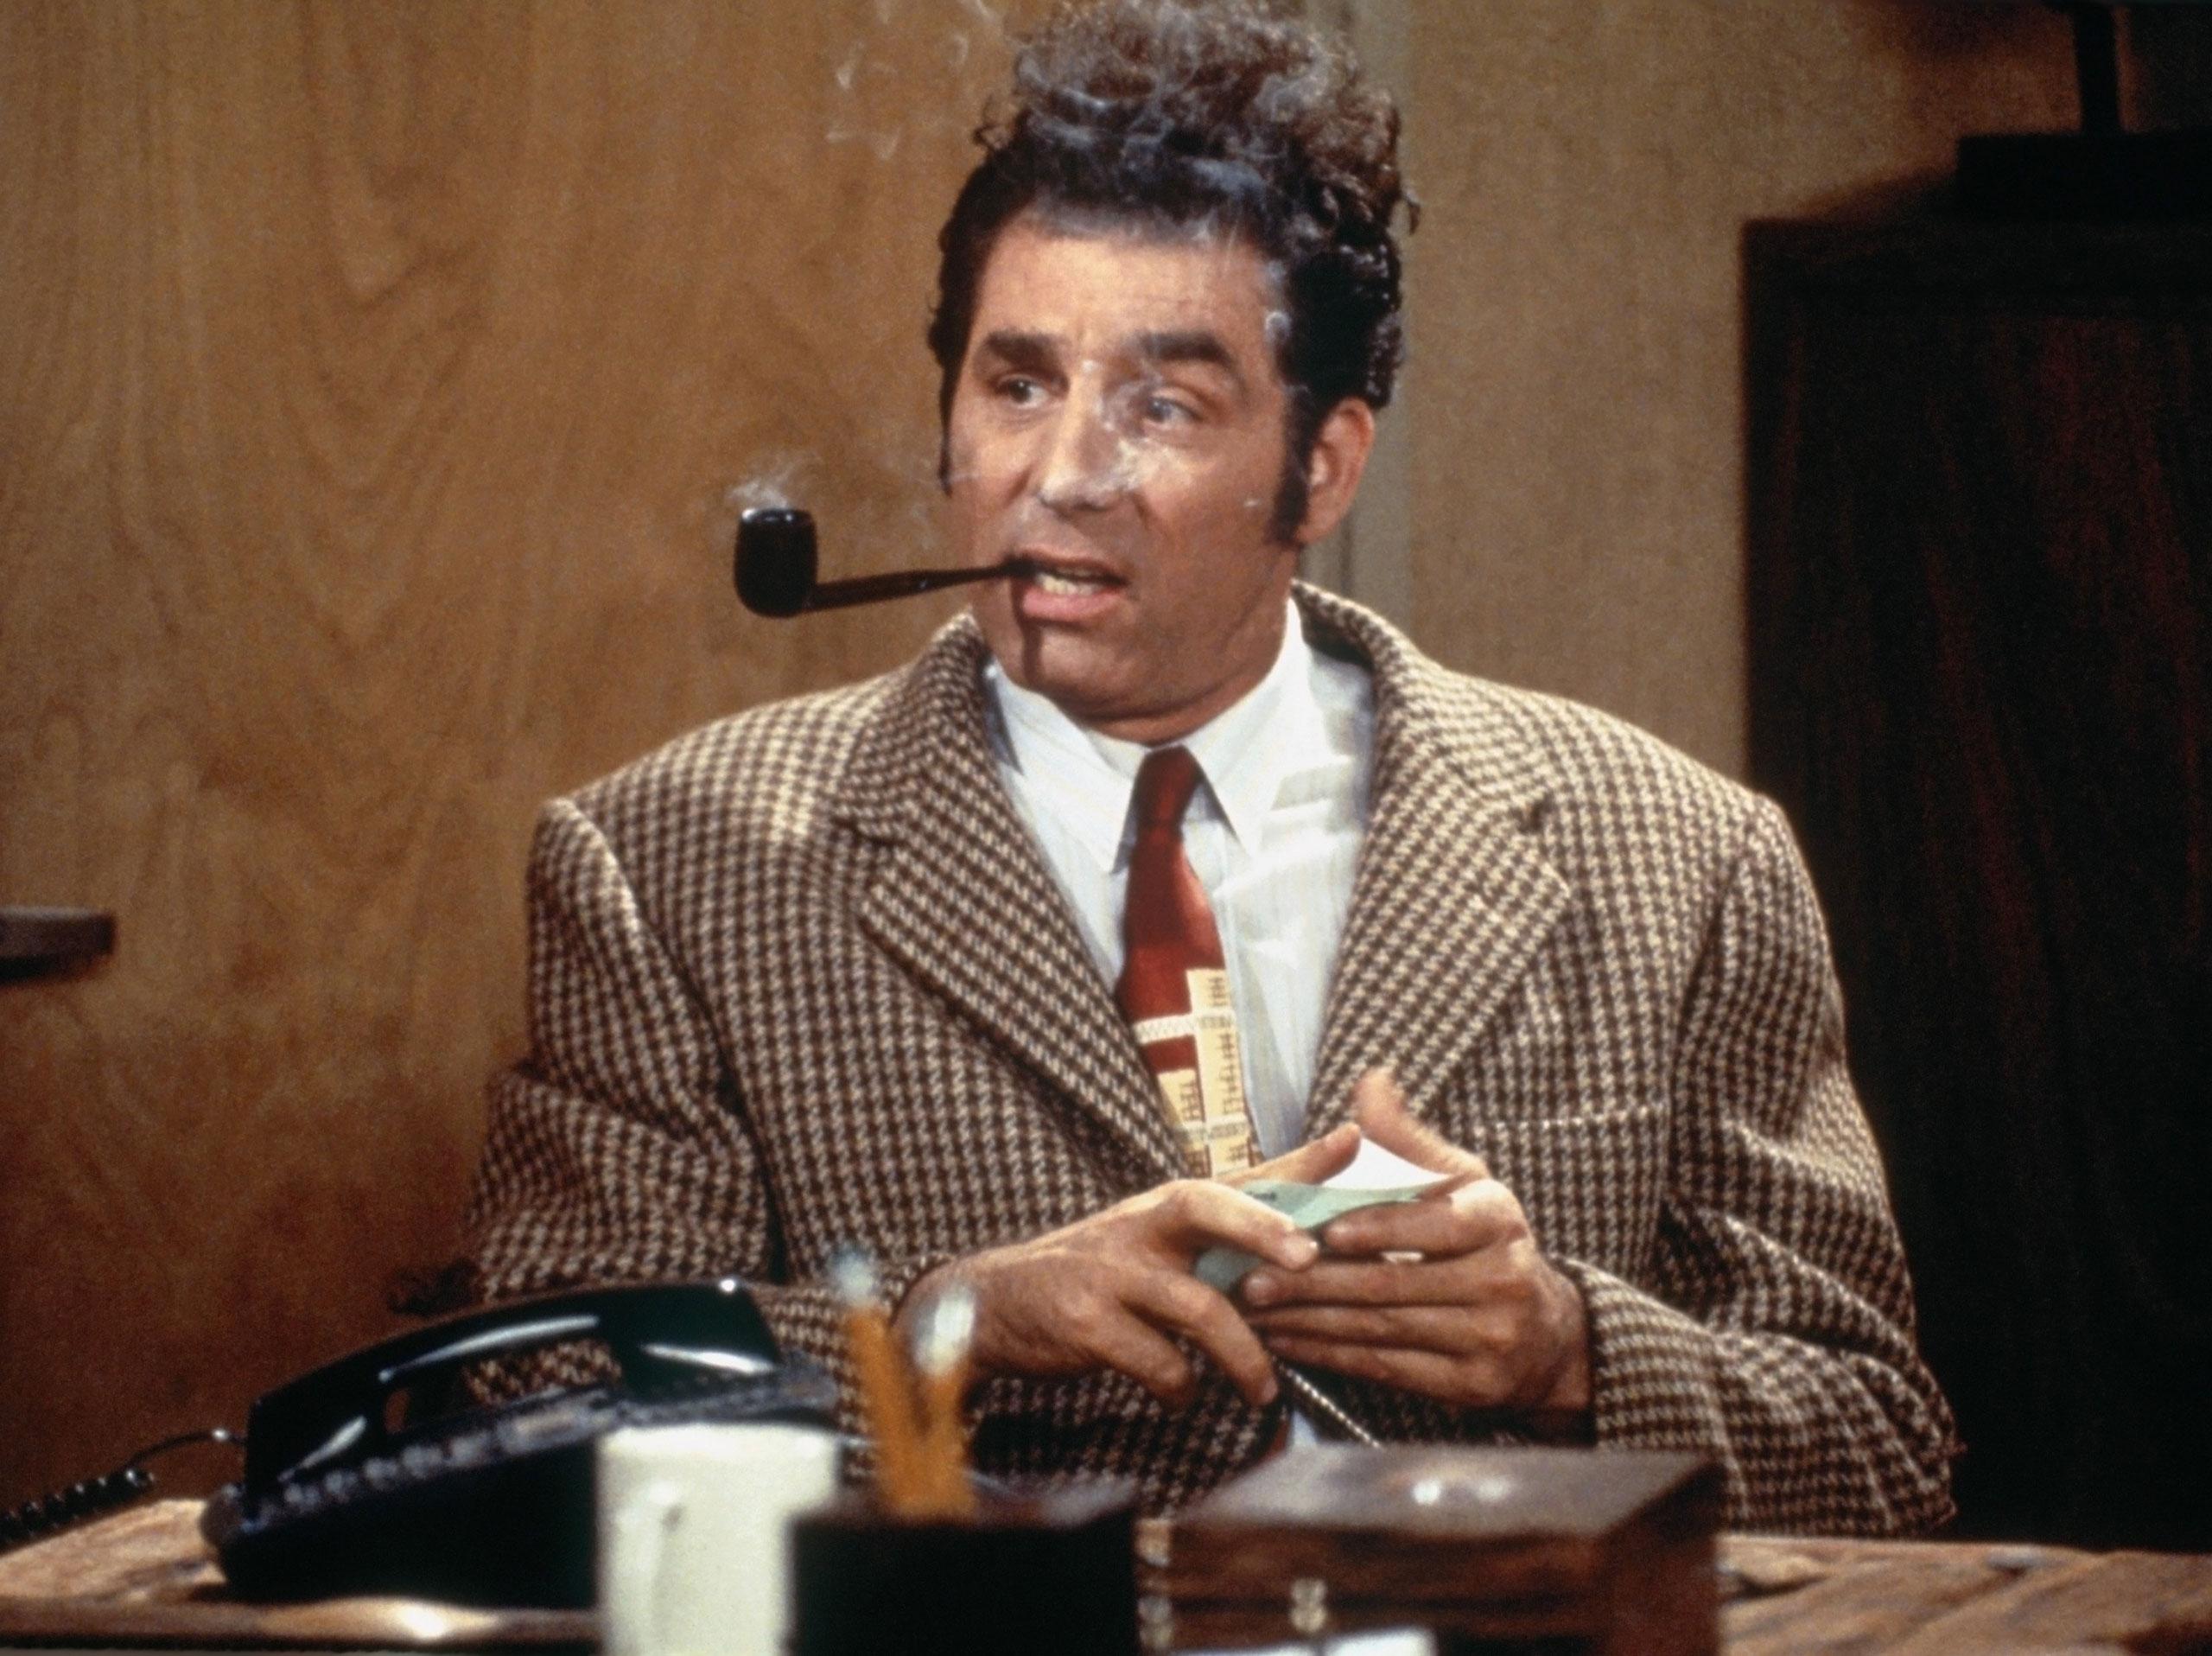 Michael Richards as Cosmo Kramer in the 2006 Seinfeld episode  The Van Buren Boys.